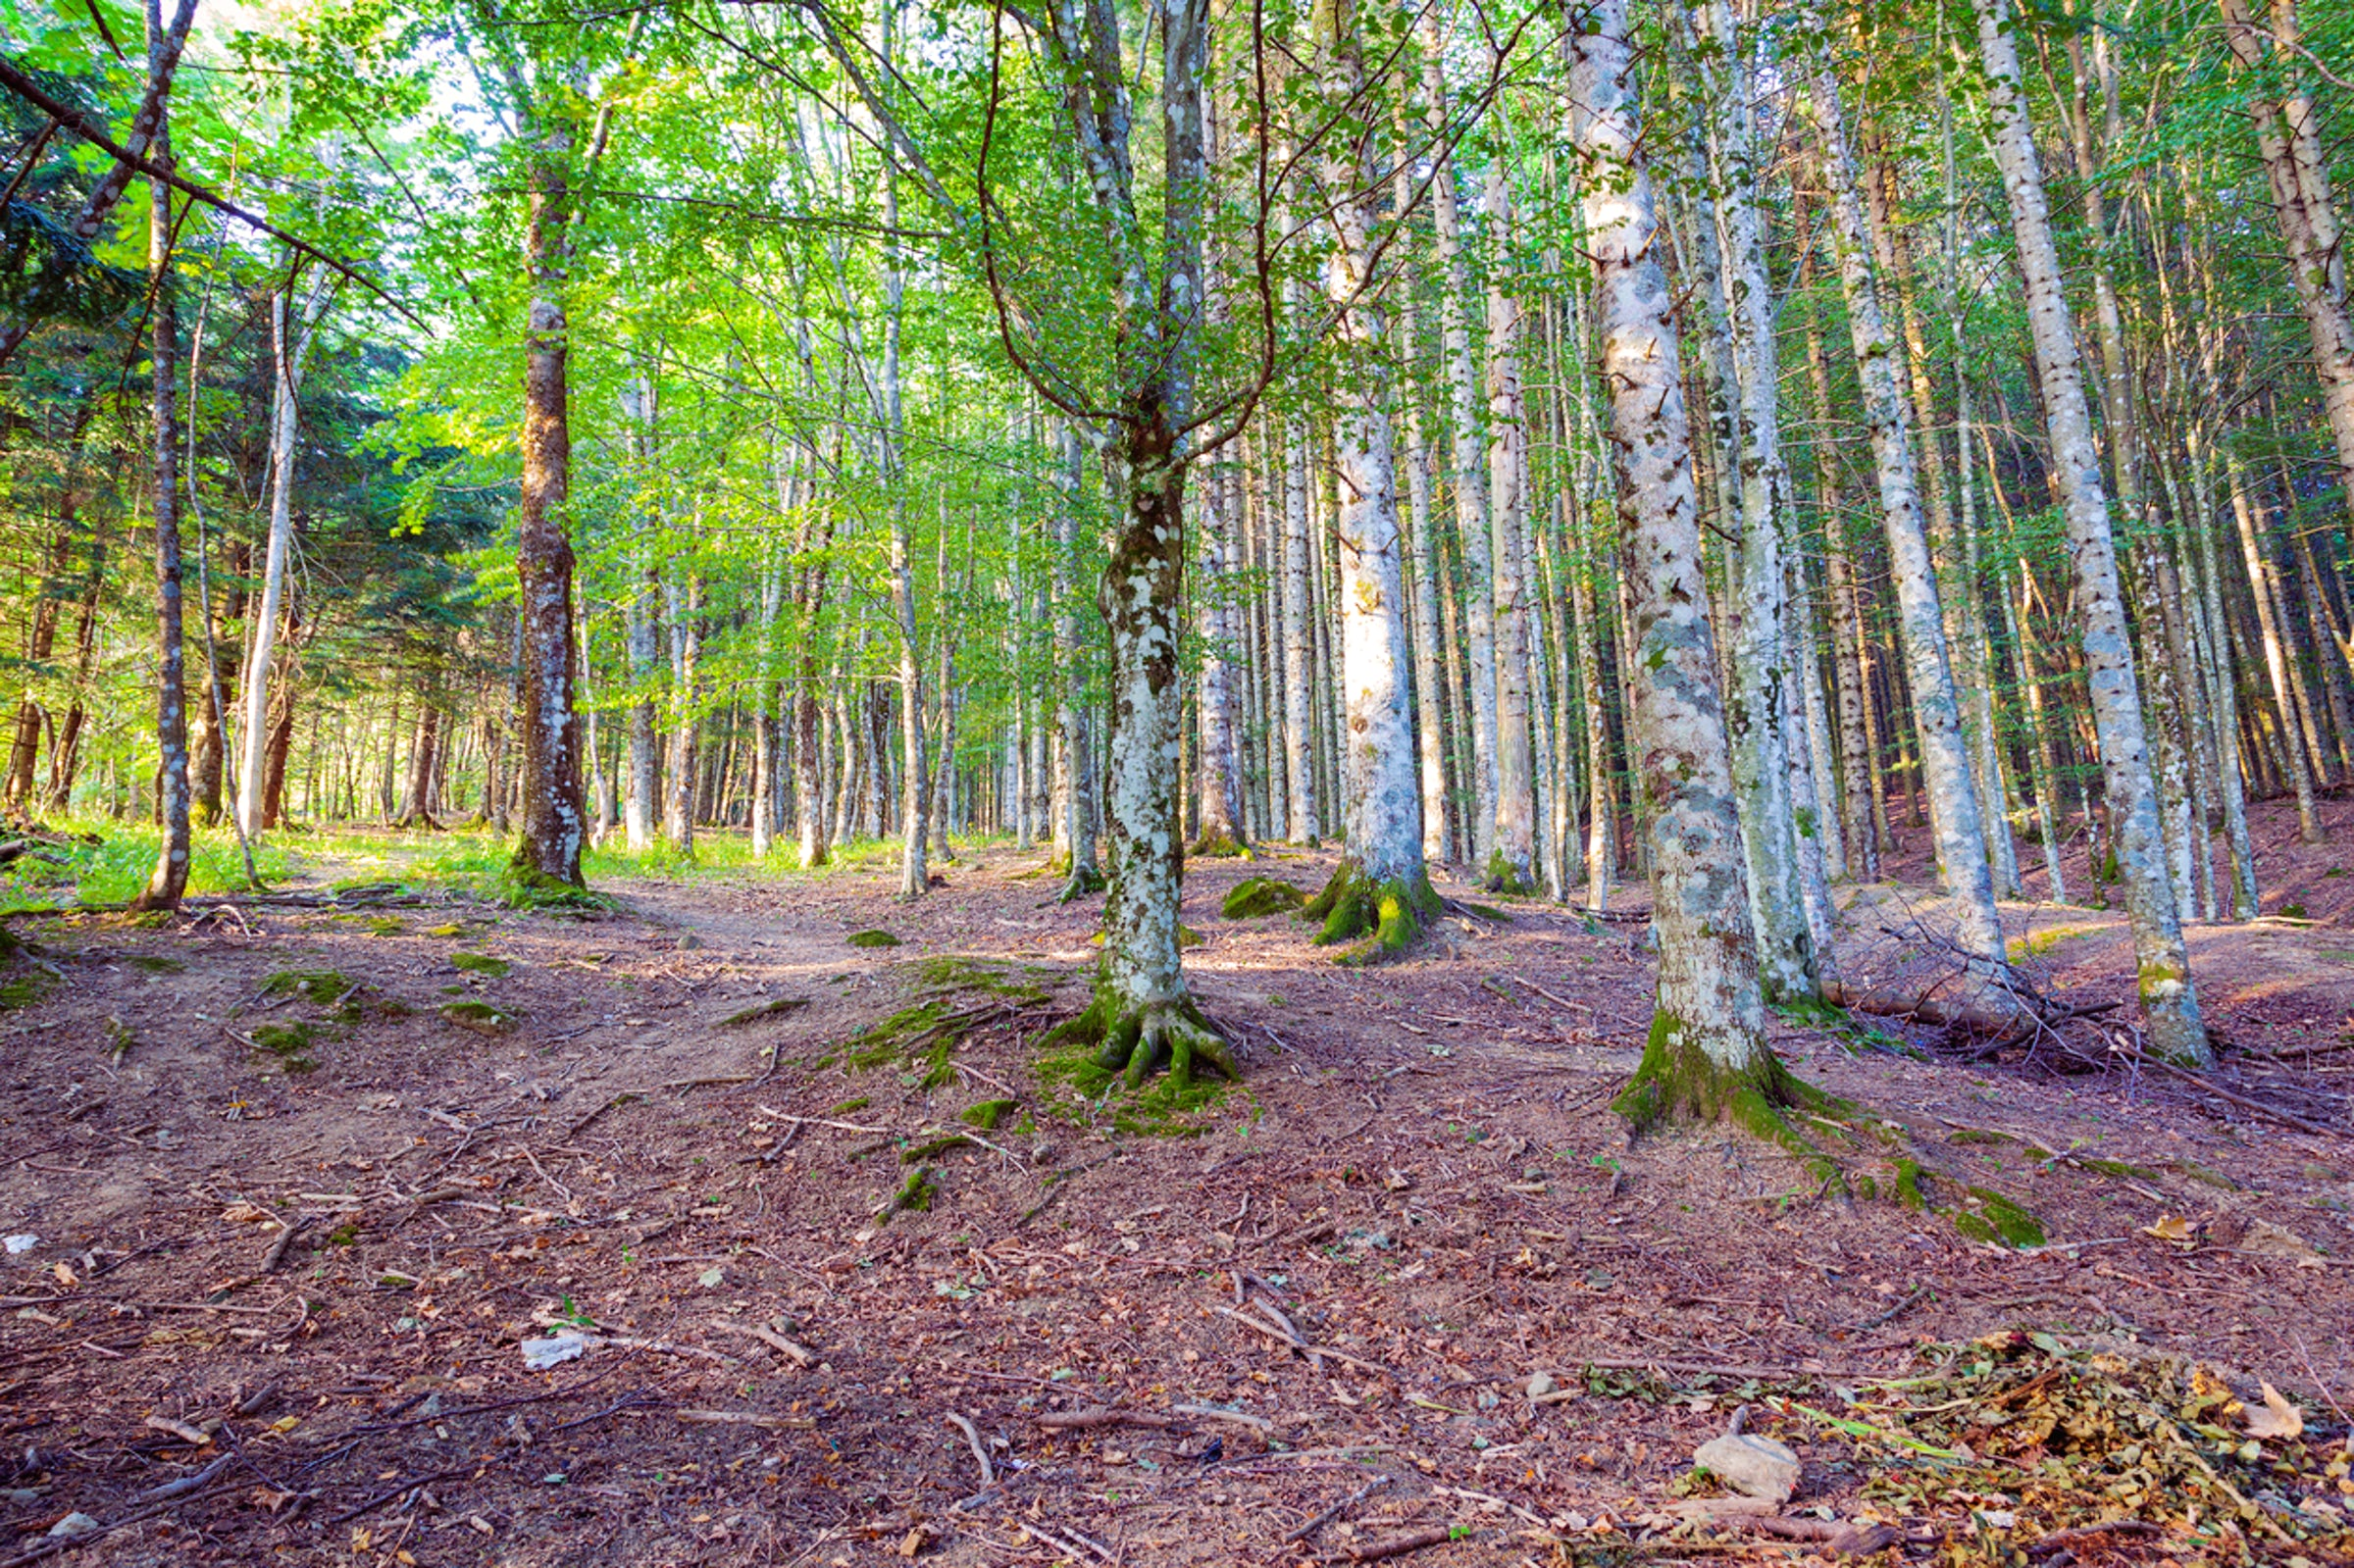 Italian Forest: Casentino National Park